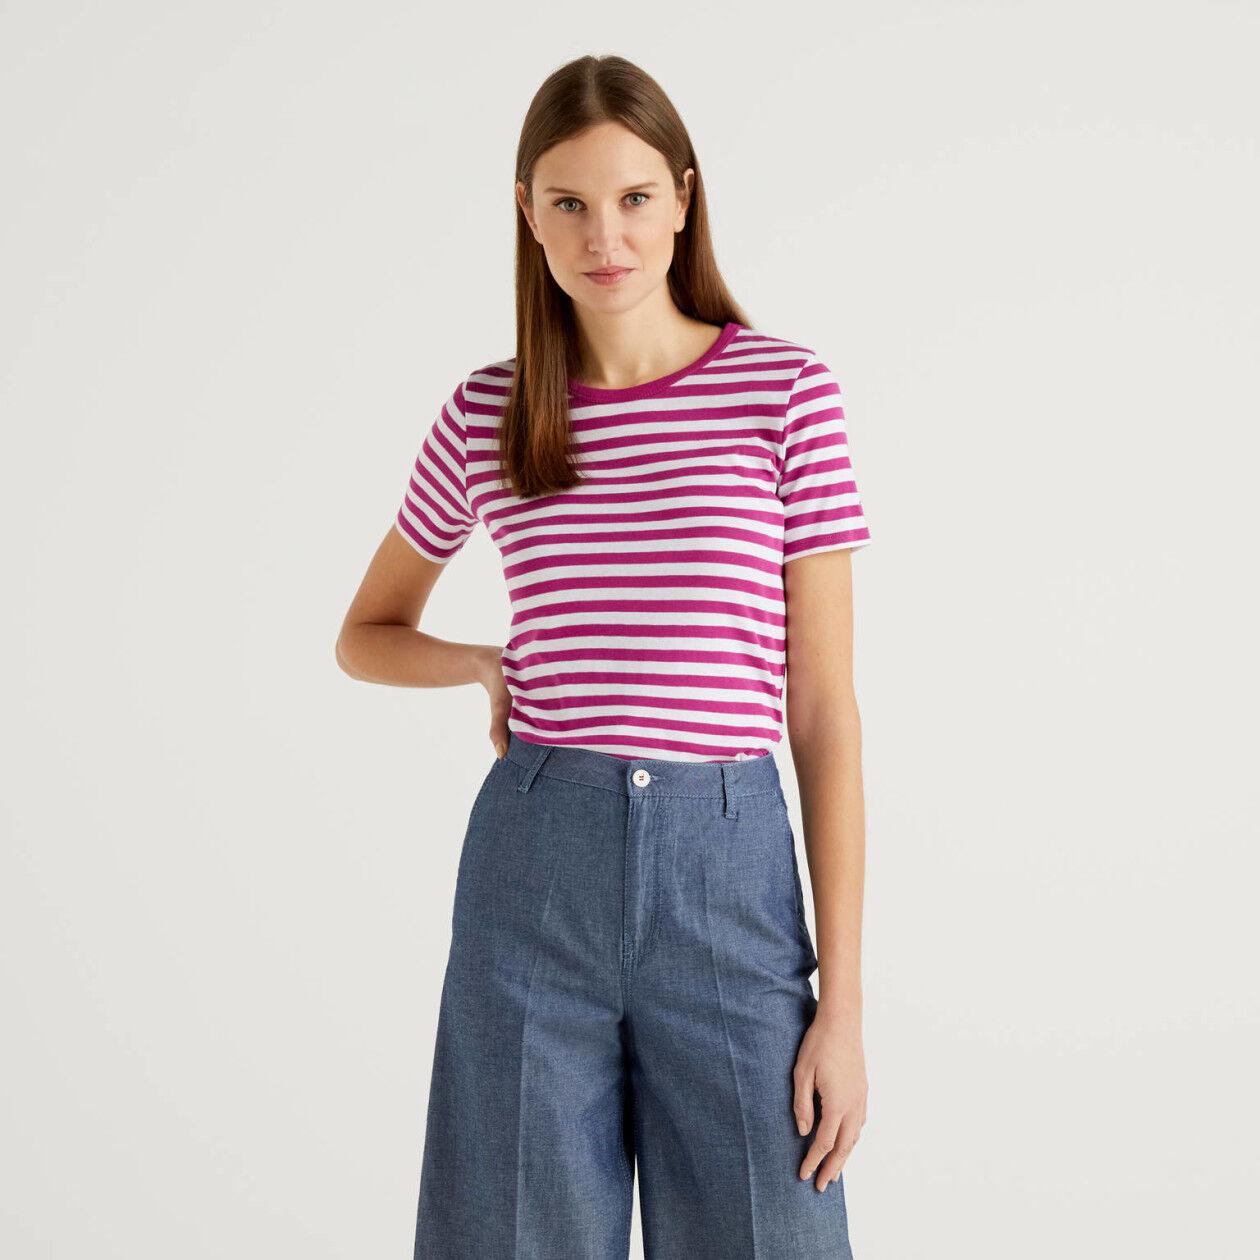 Crew neck striped t-shirt